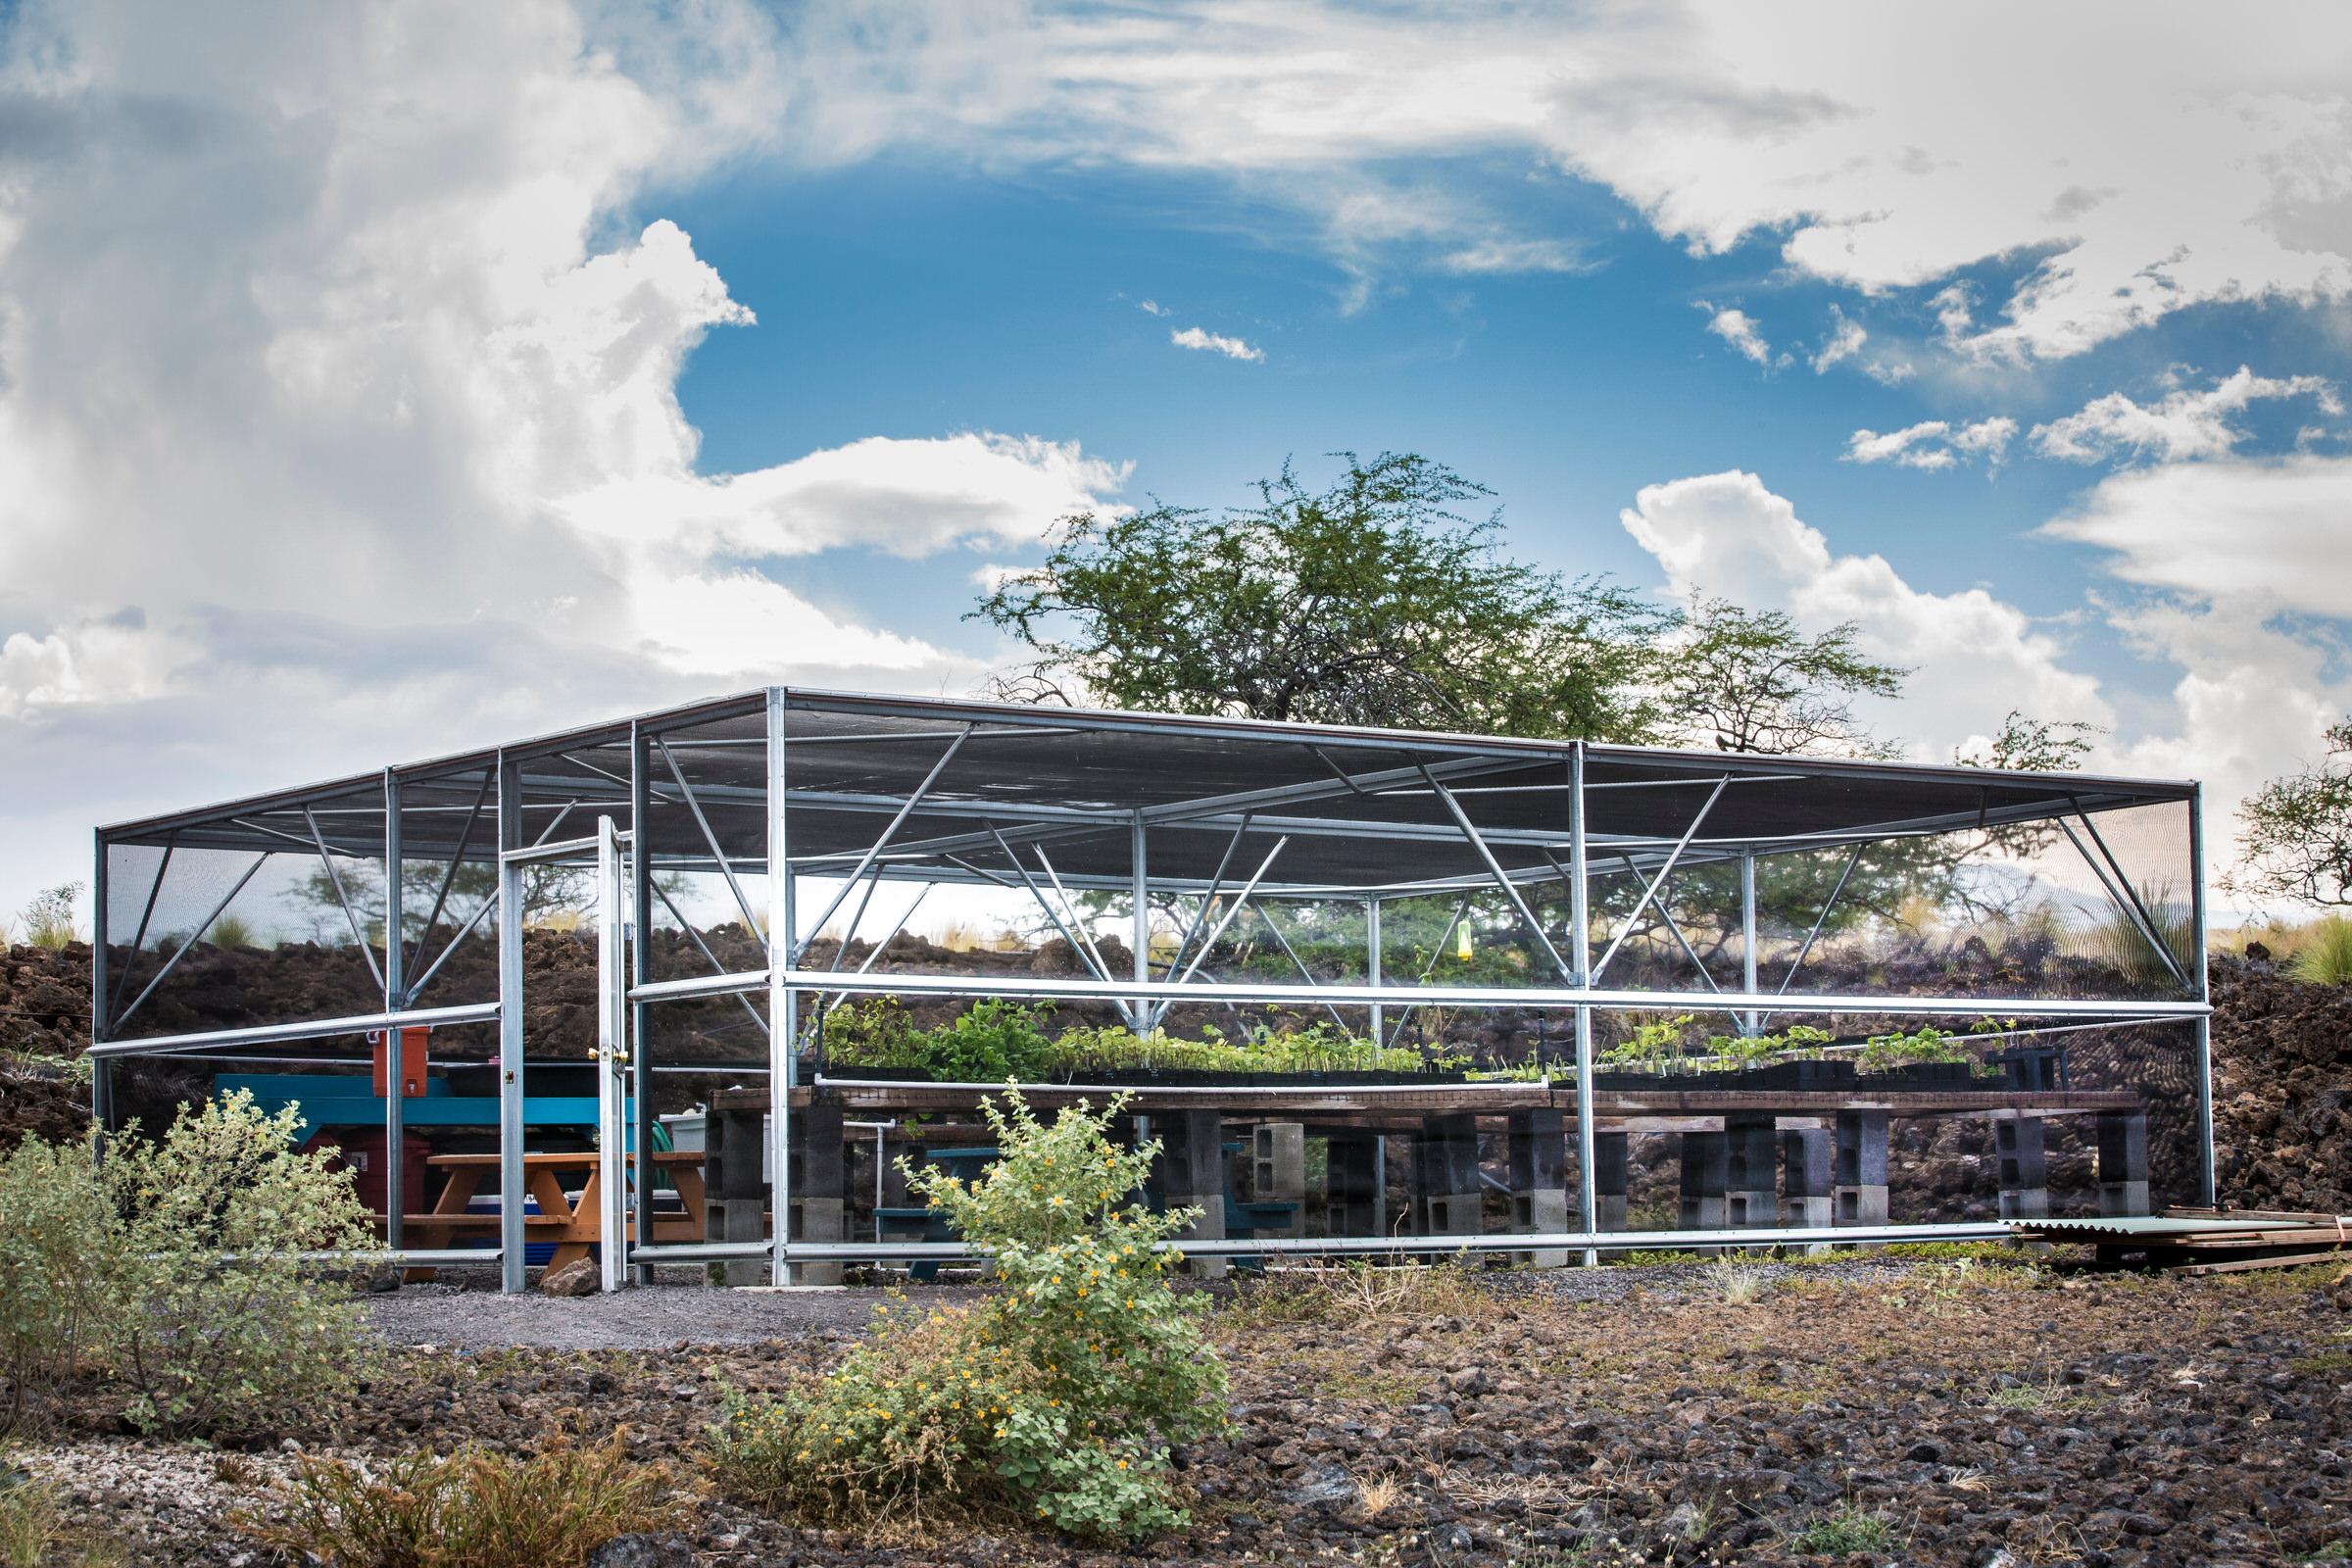 green-house-nusery-willi-willi-tree-festival-Waikoloa-Village-Hawaii-Island-South-Kohala-329.jpg